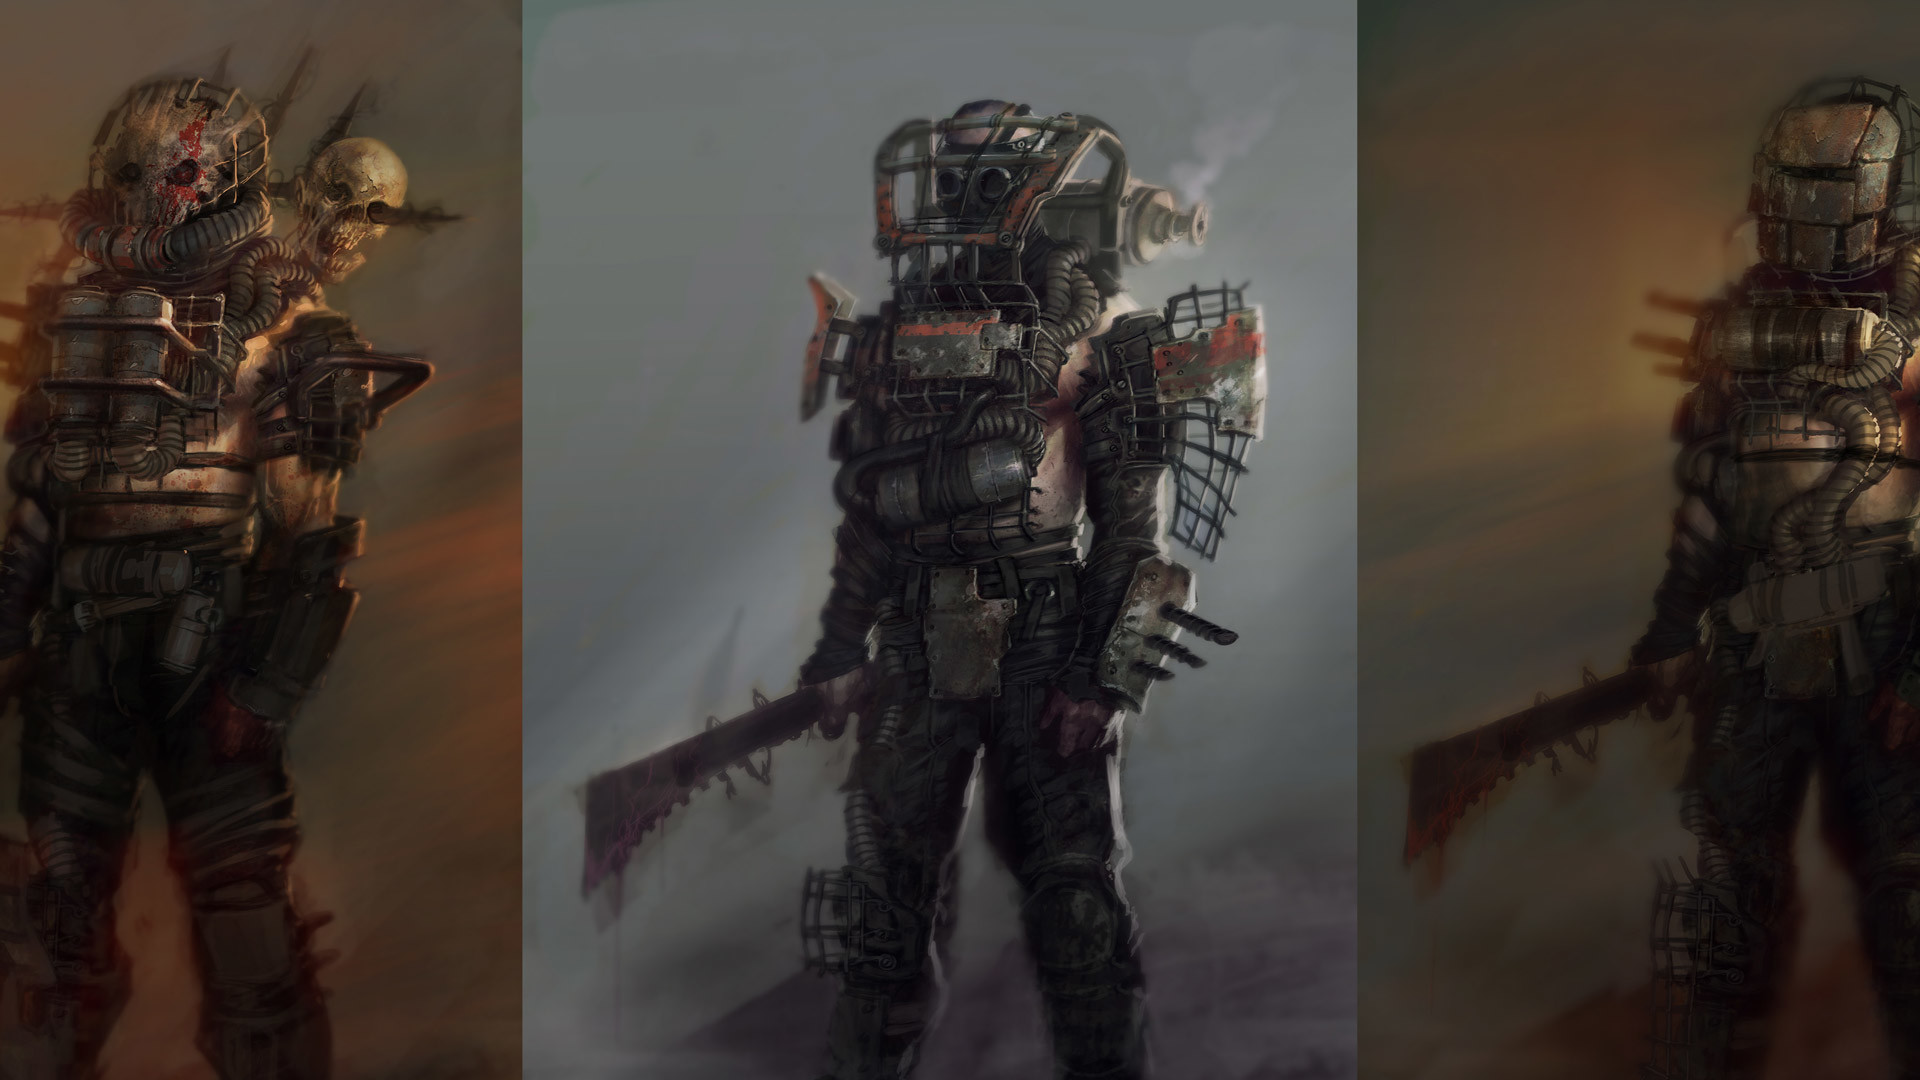 Slideshow: E3 2015: Badass Fallout 4 wallpapers | IGN India